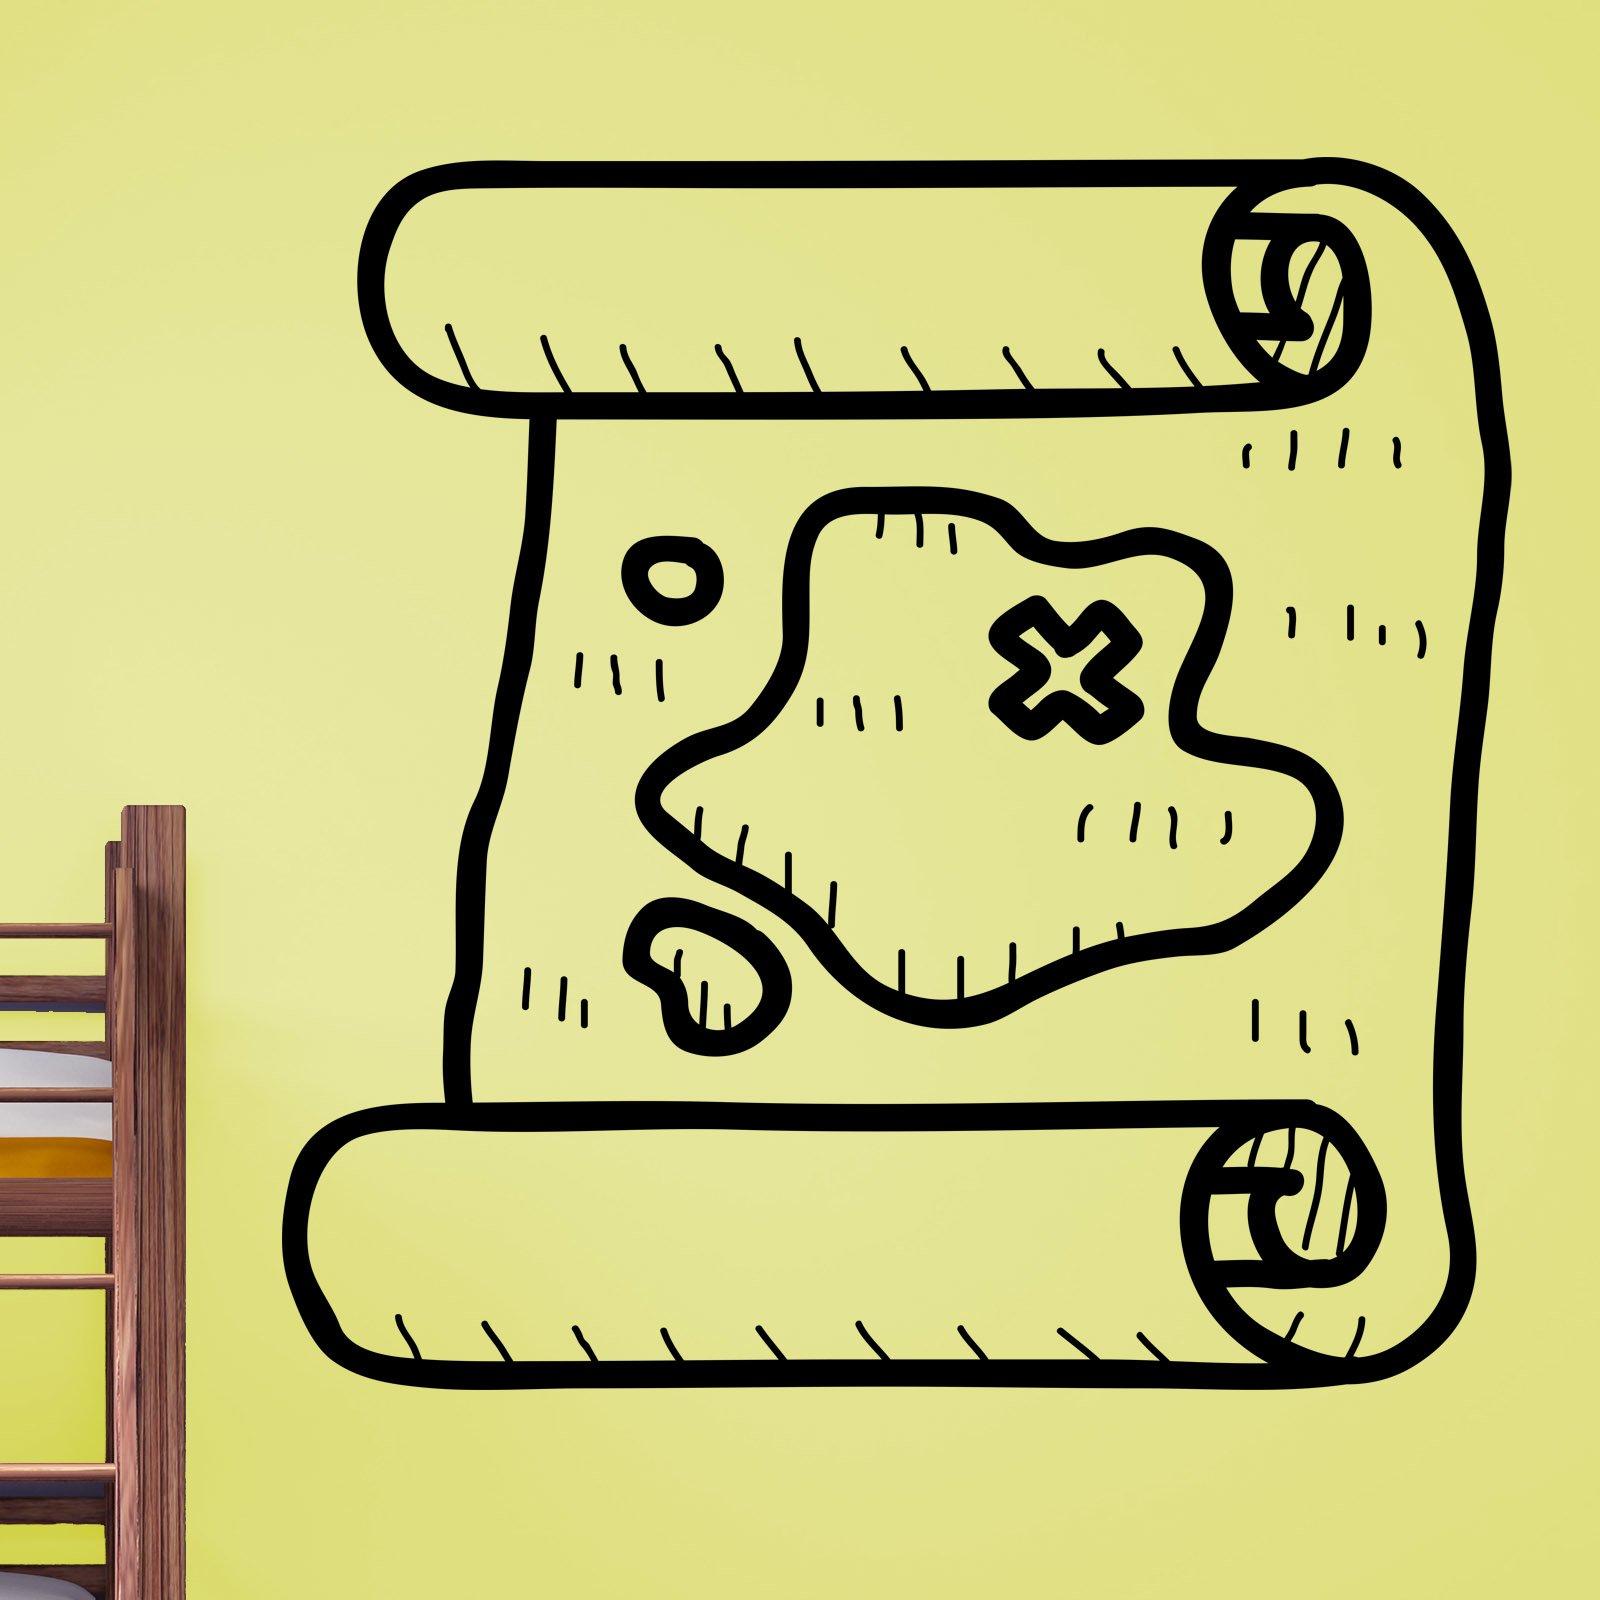 Cartoon Pirate Treasure Map Kids Wall Sticker - World of Wall Stickers